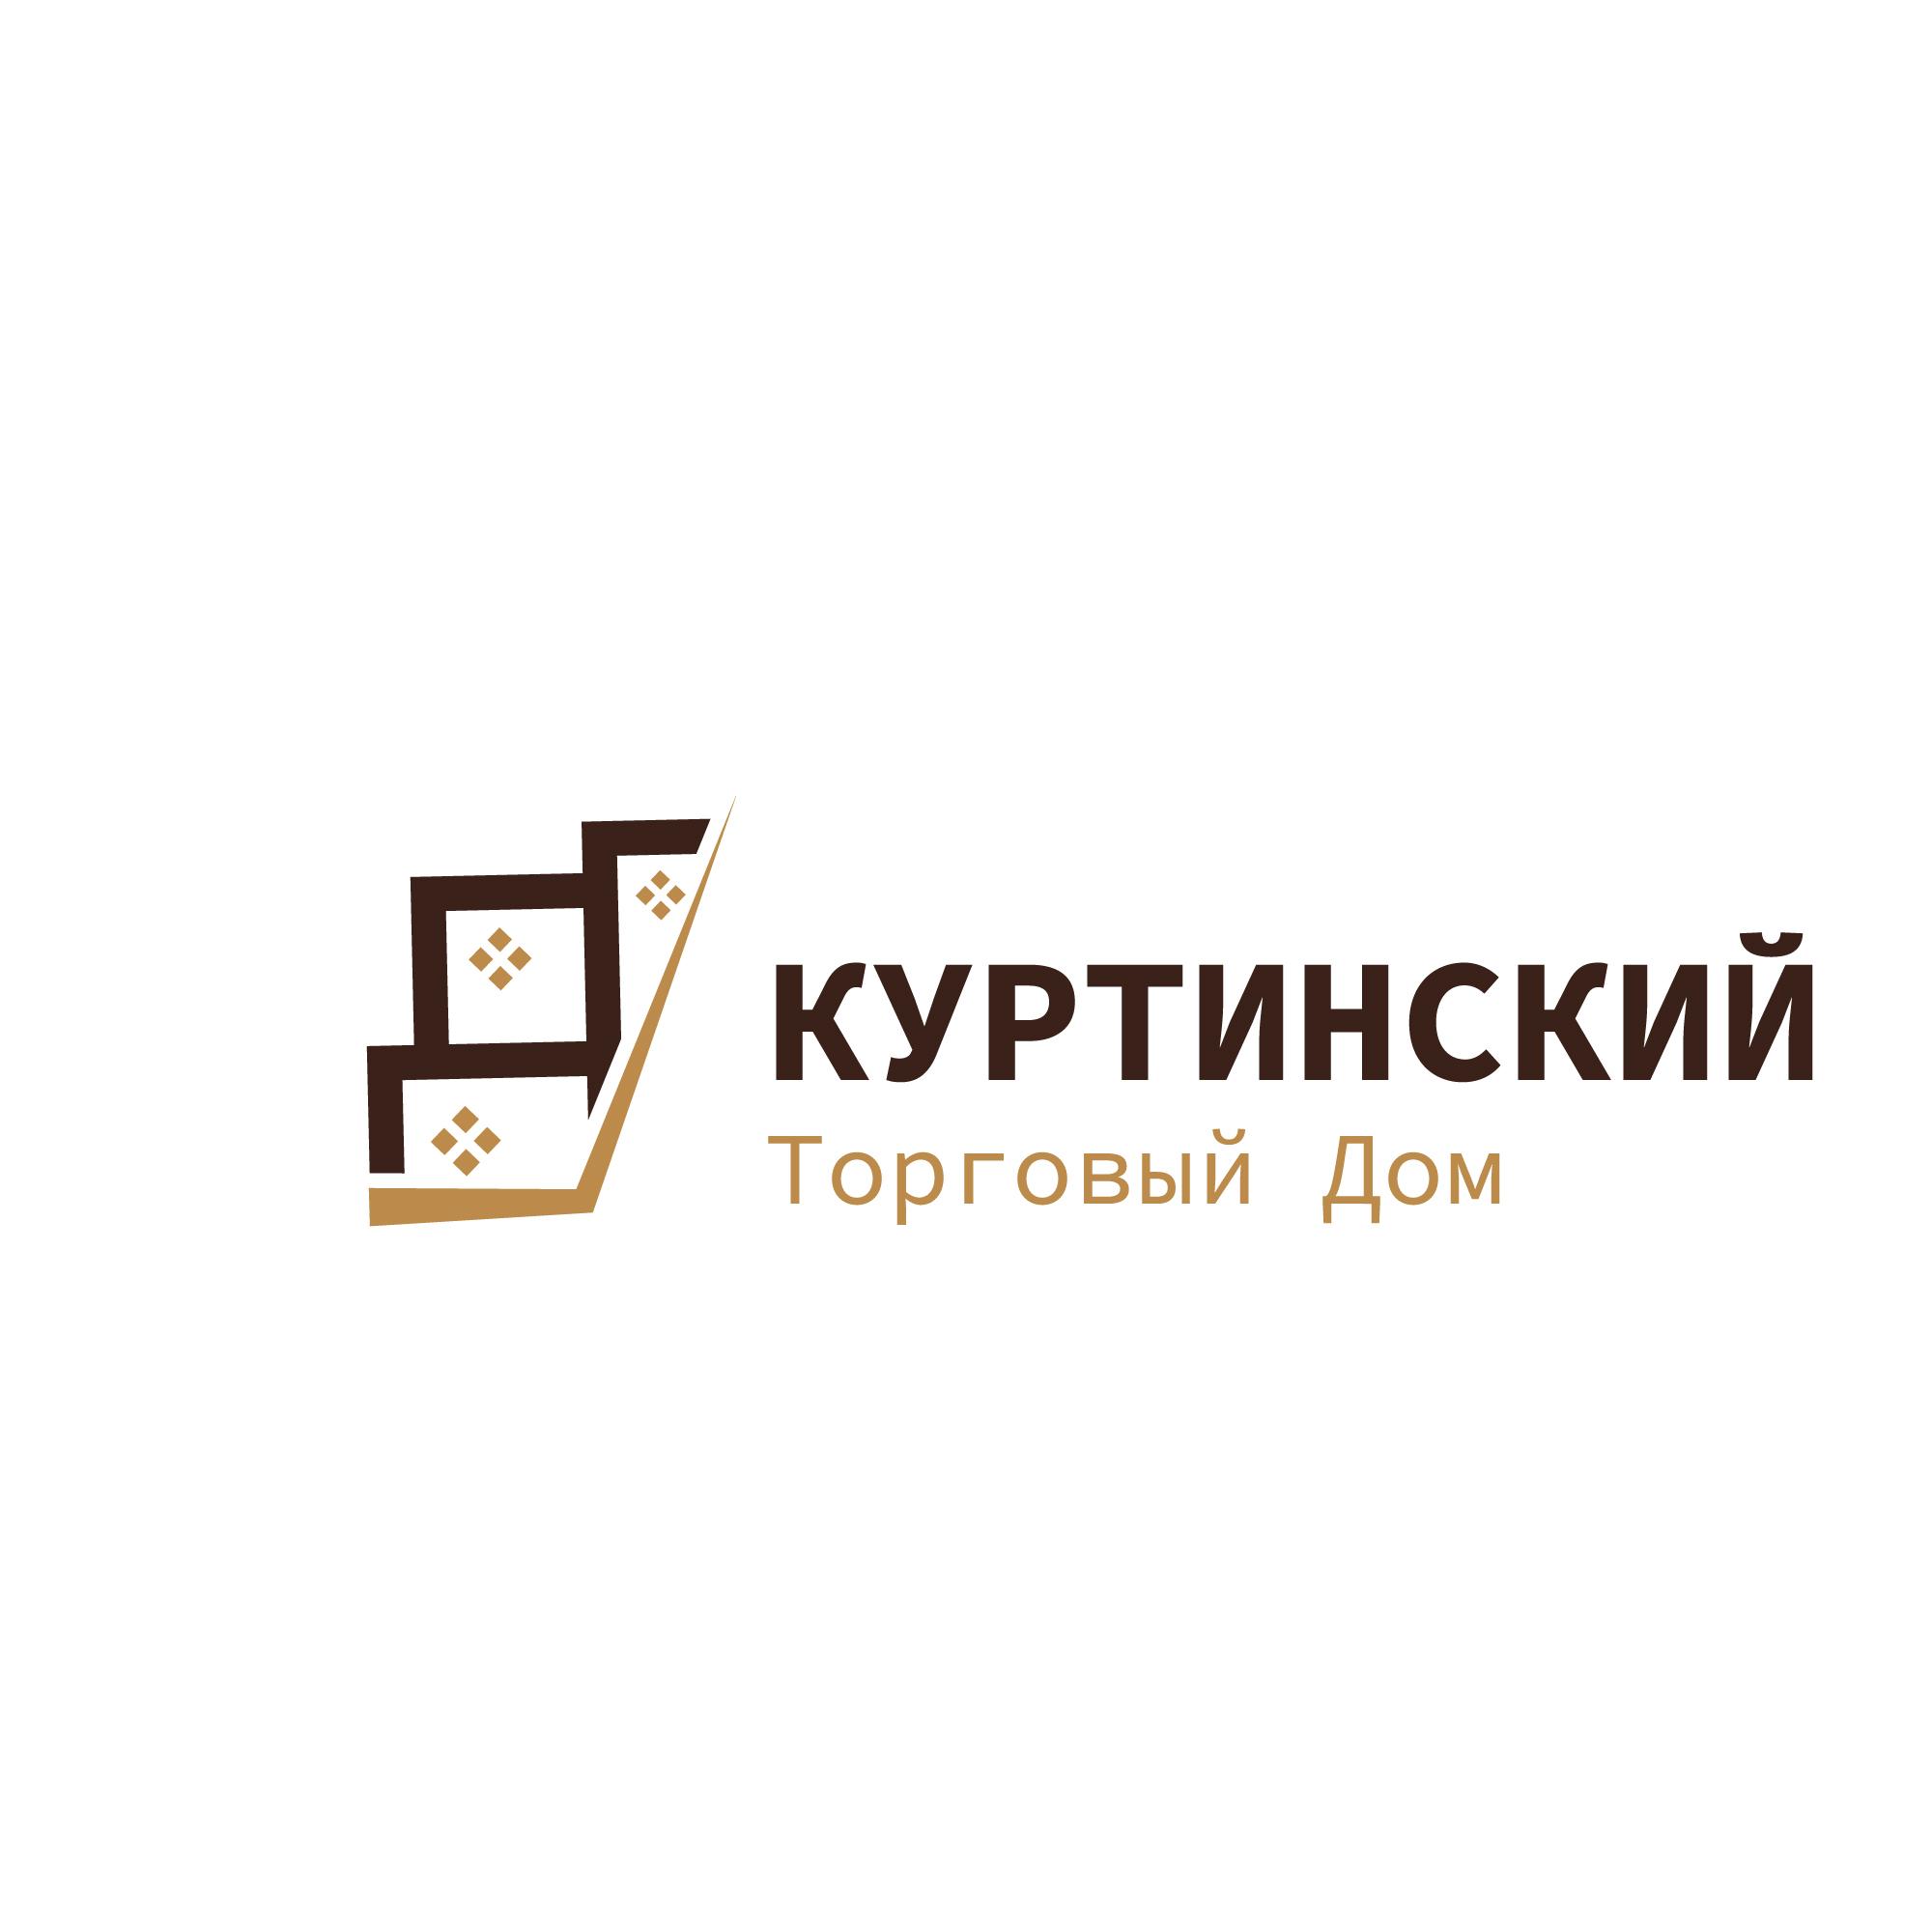 Логотип для камнедобывающей компании фото f_9725b9ad67f8f16e.jpg